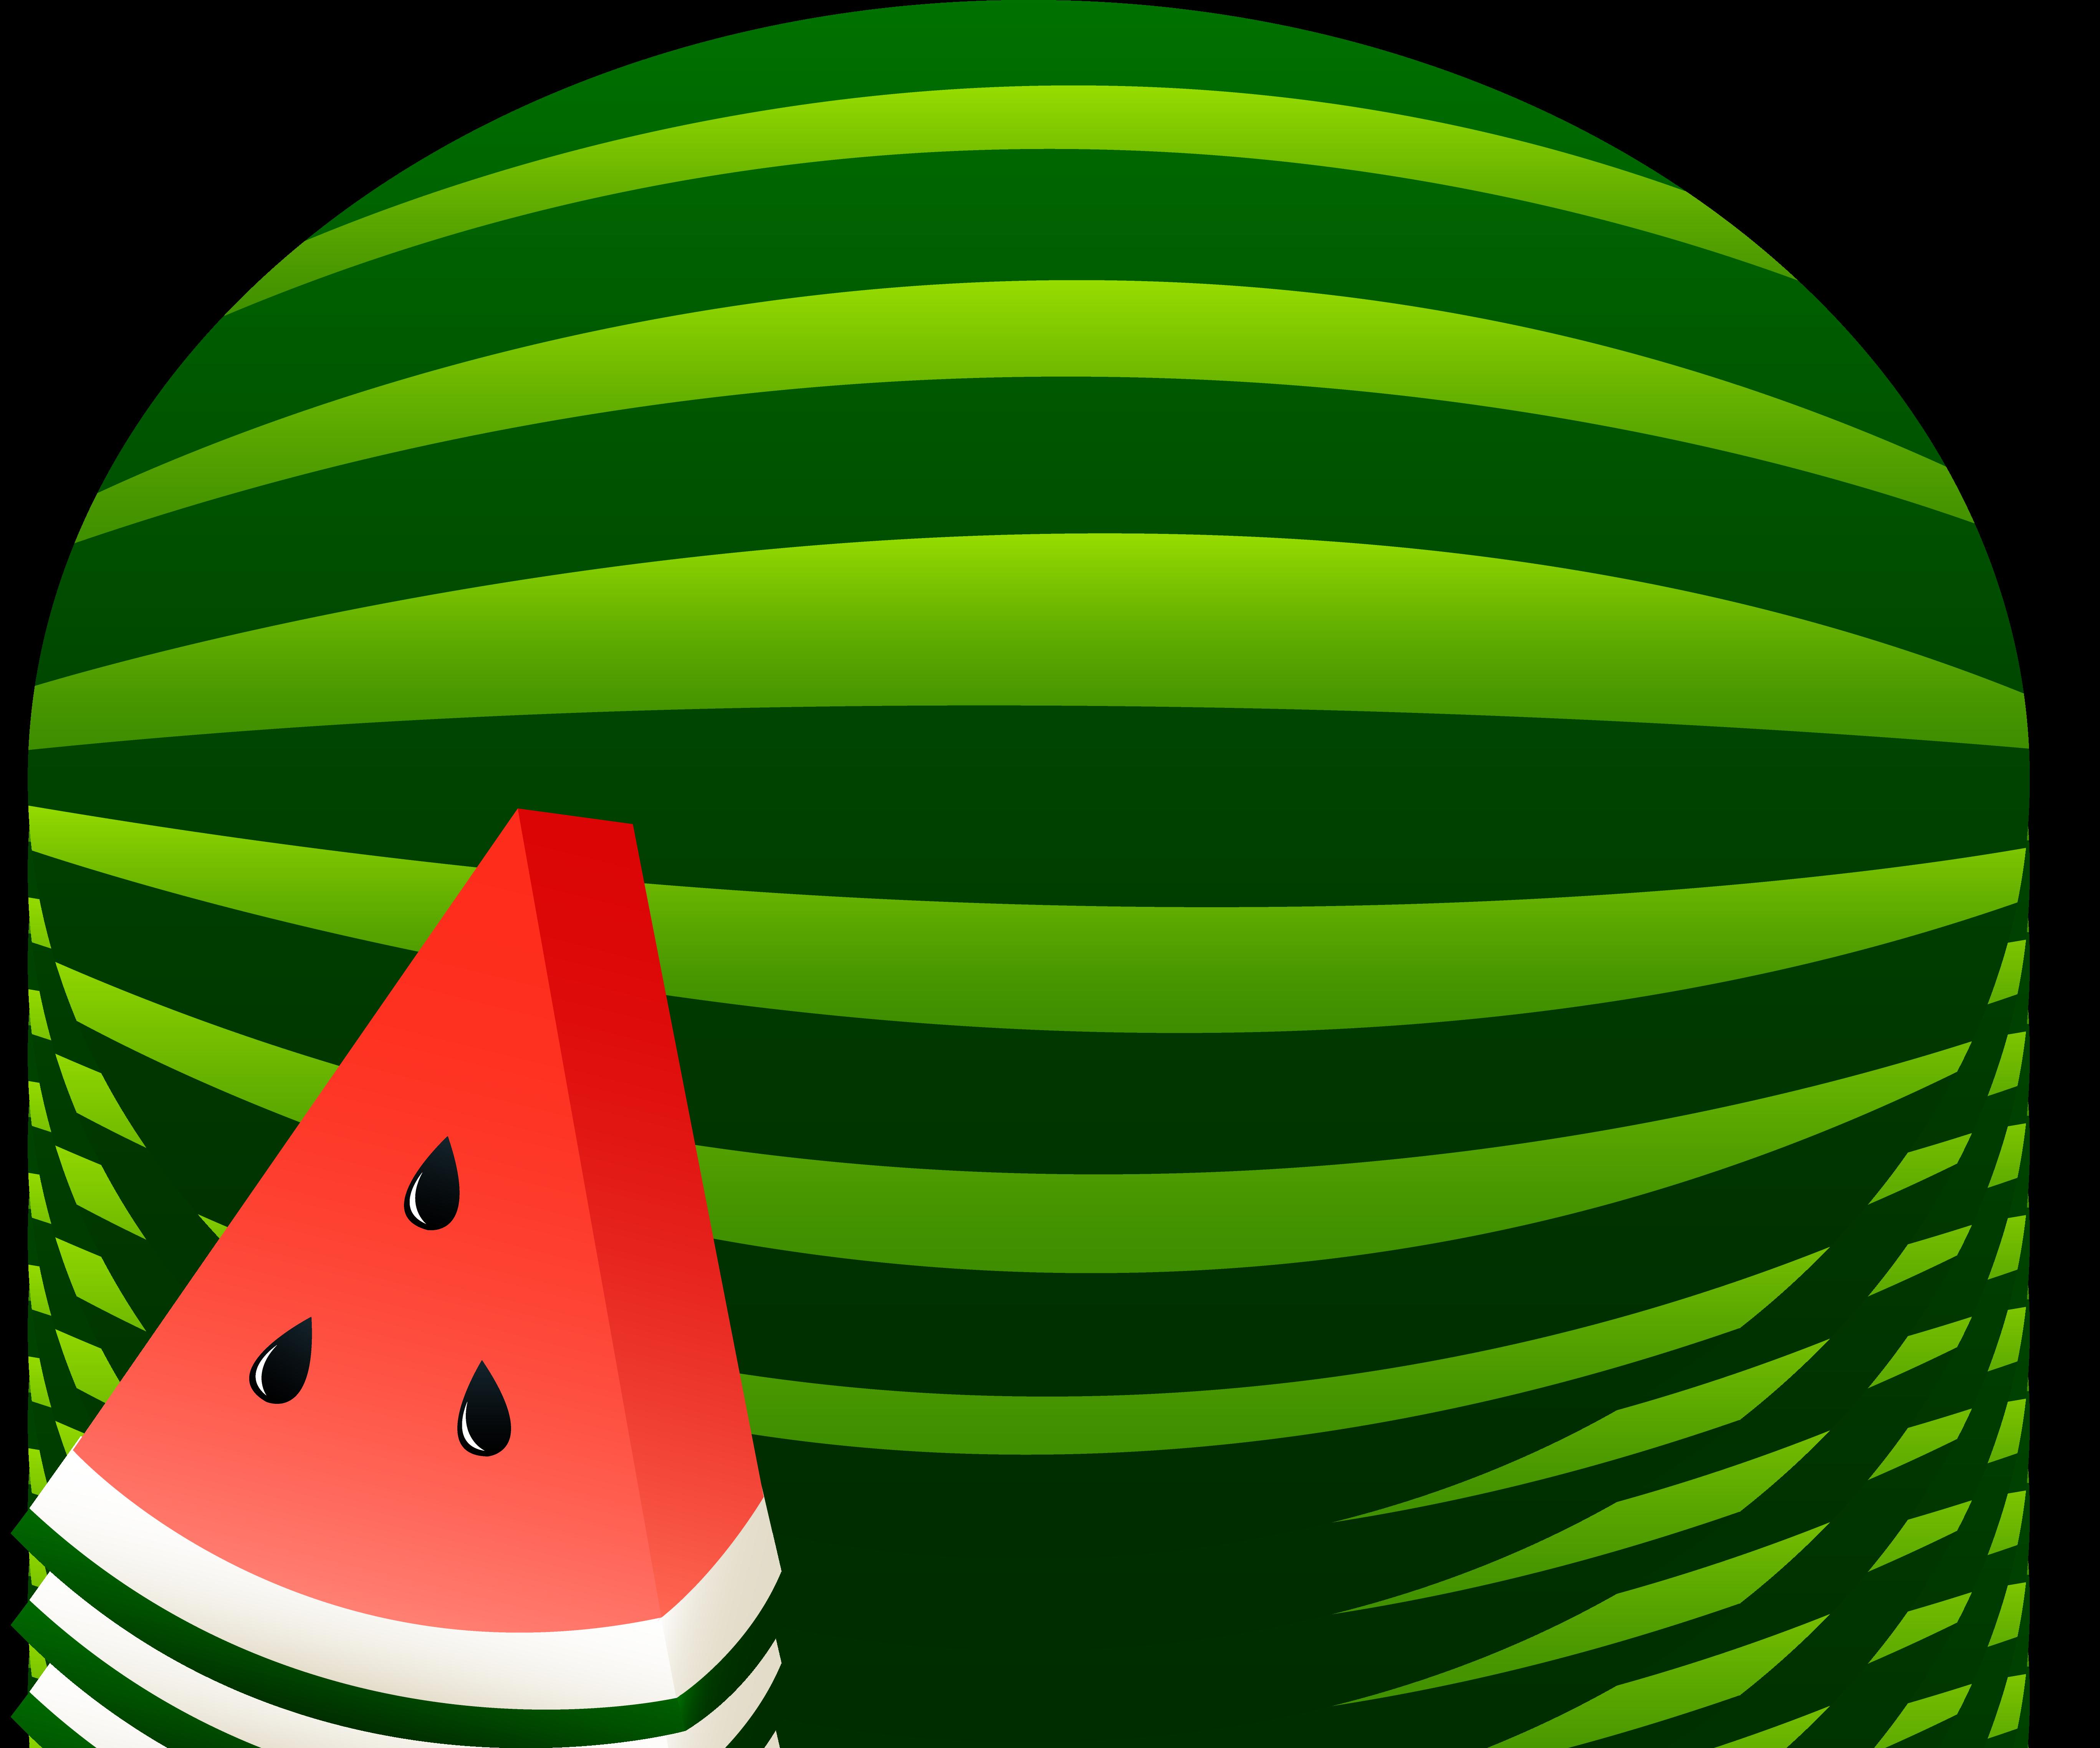 Watermelon Whole and Slice - Free Clip Art